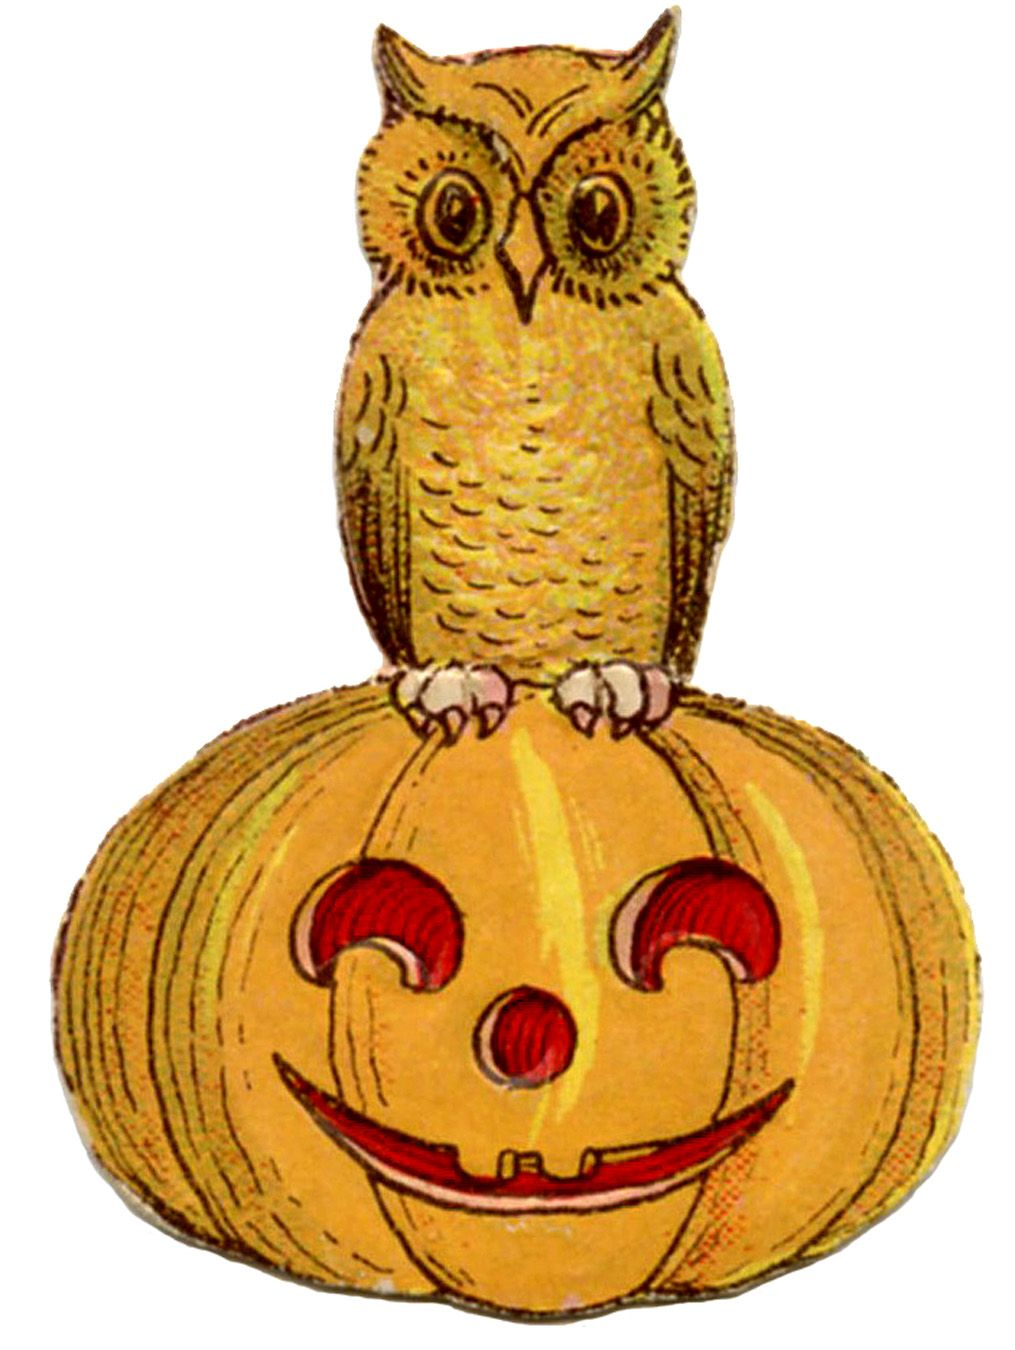 Retro Vintage Halloween Clip Art.Vintage Halloween Clip Art Cute Owl On Pumpkin Vintage Halloween